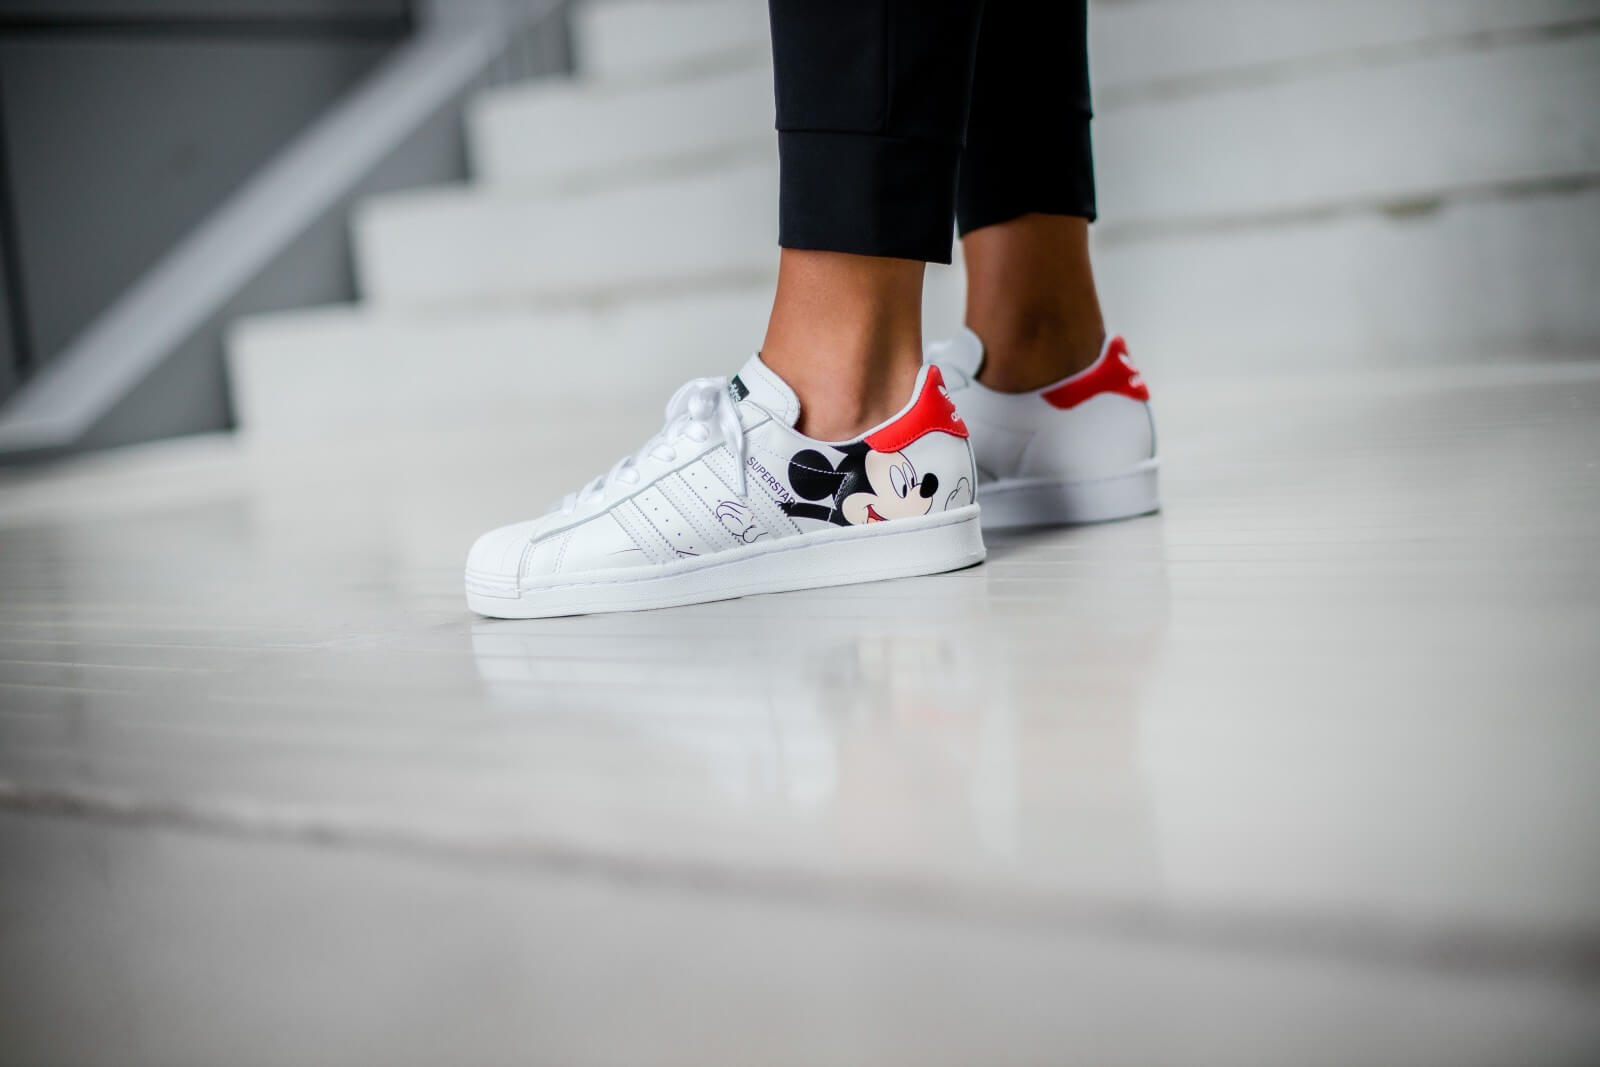 Adidas x Disney Superstar Footwear WhiteCore Black FW2901